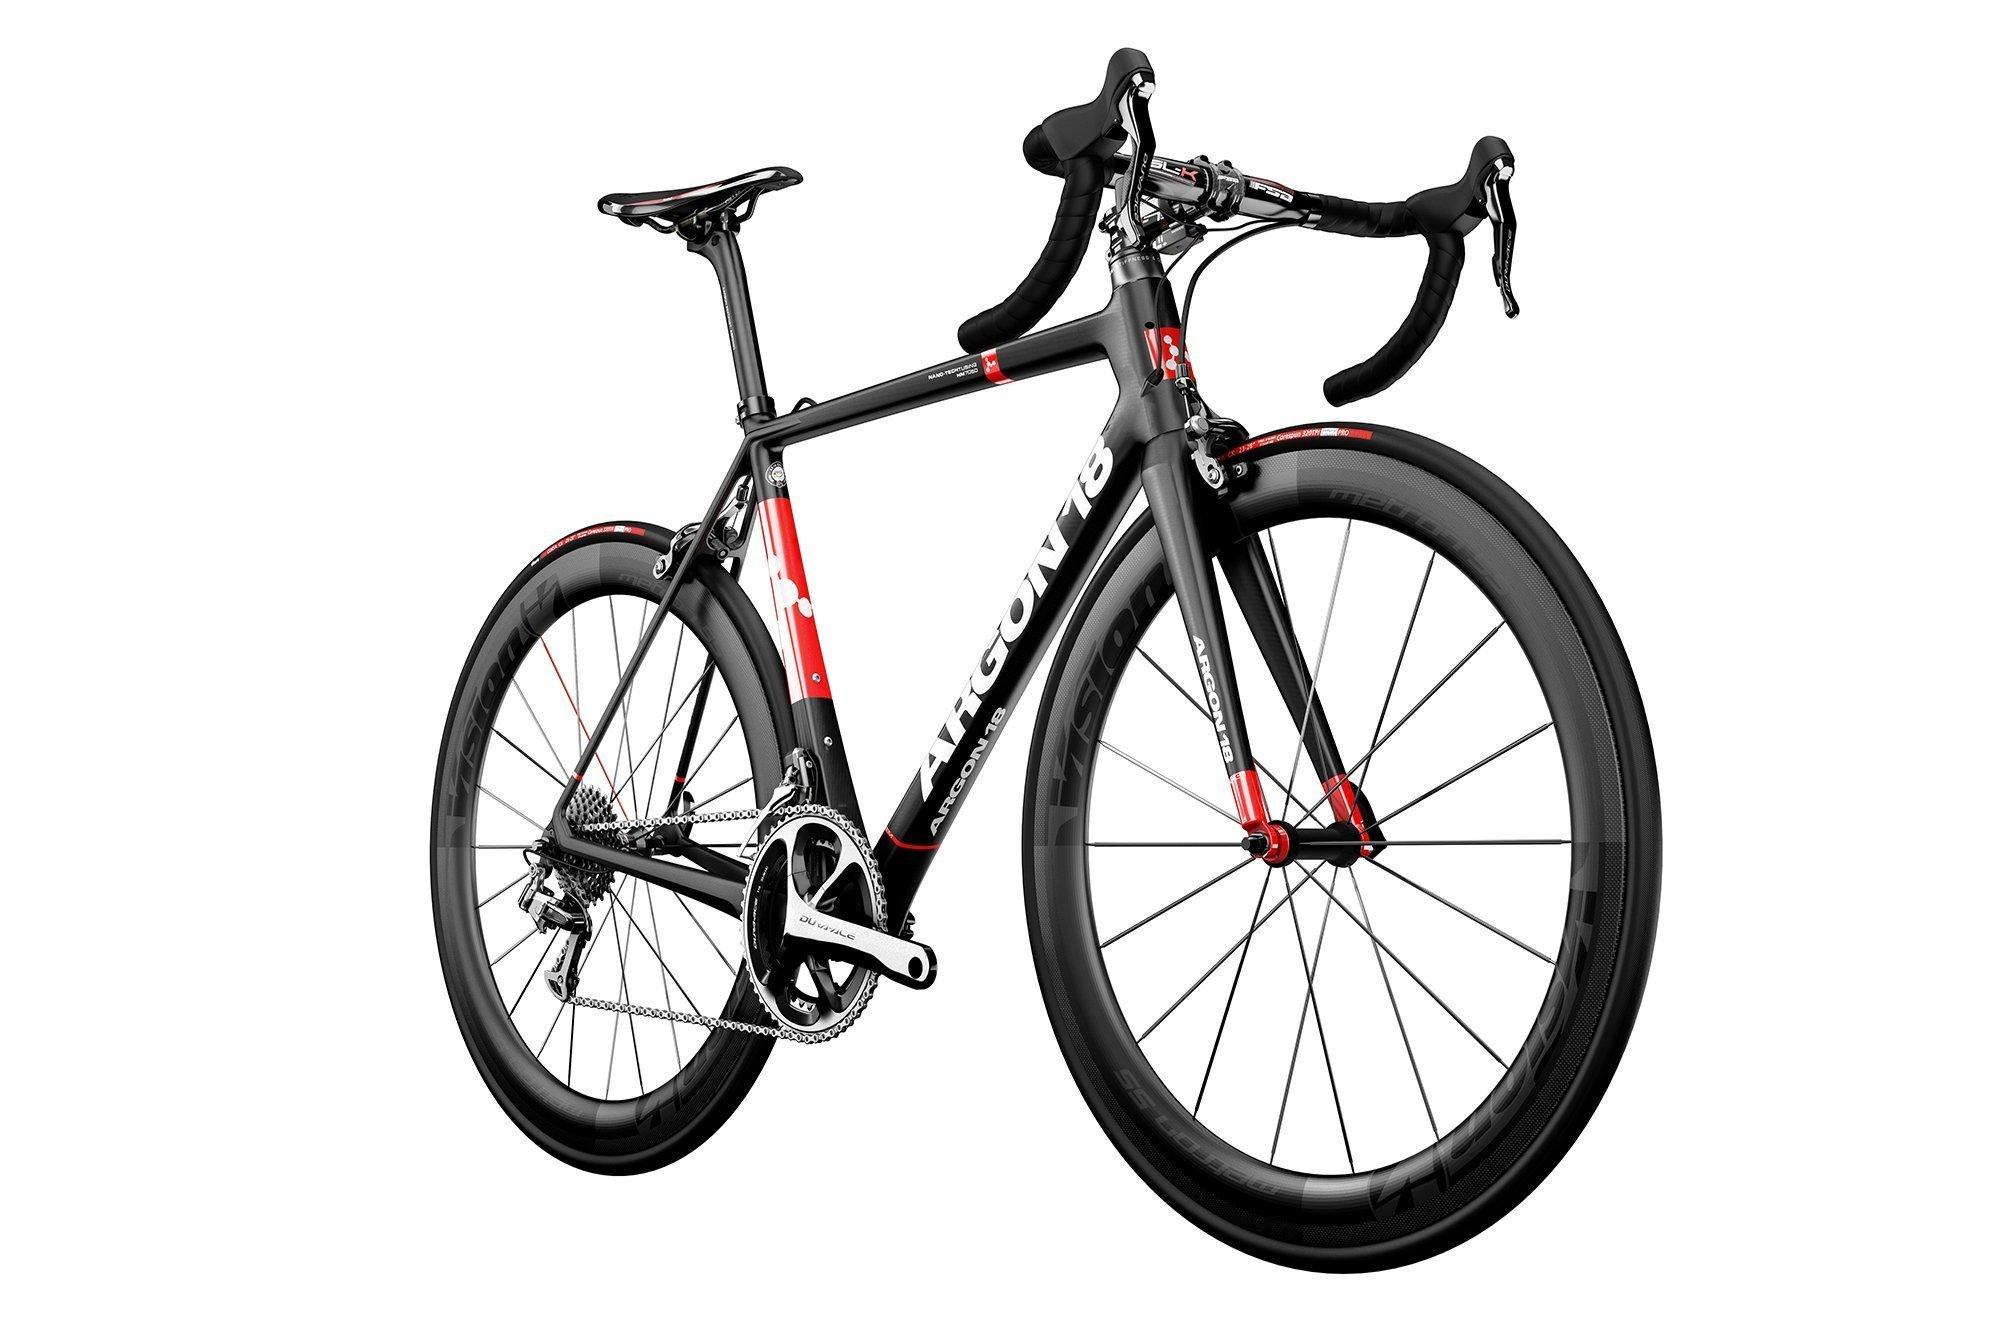 2000x1335 United Cycling